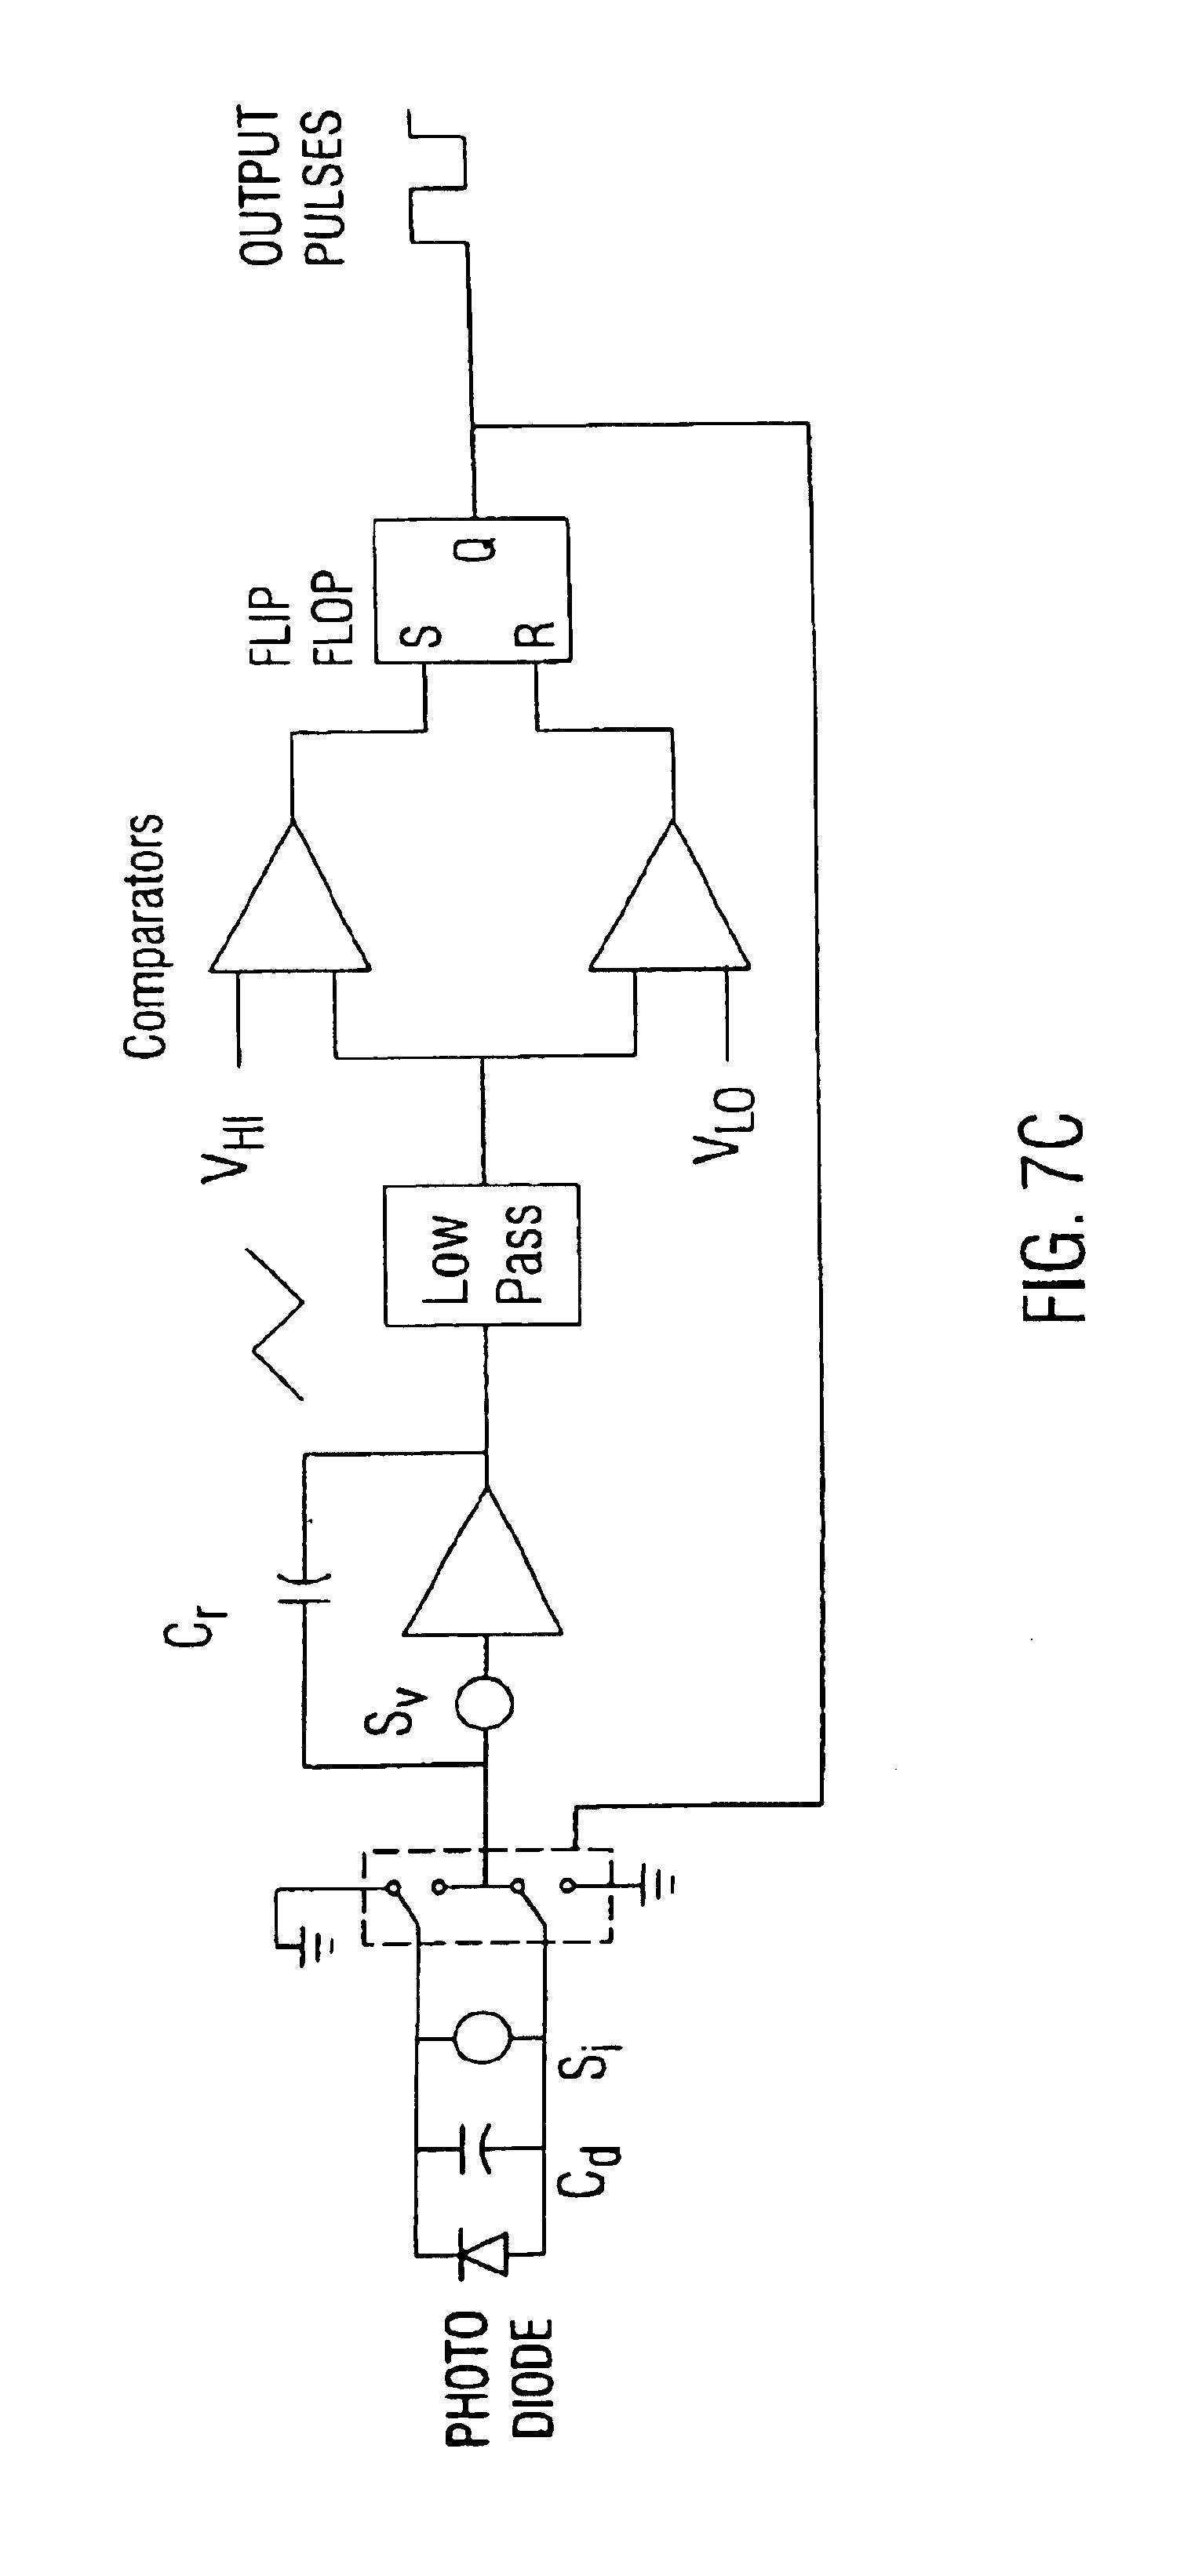 Mercede Benz M104 Engine Diagram